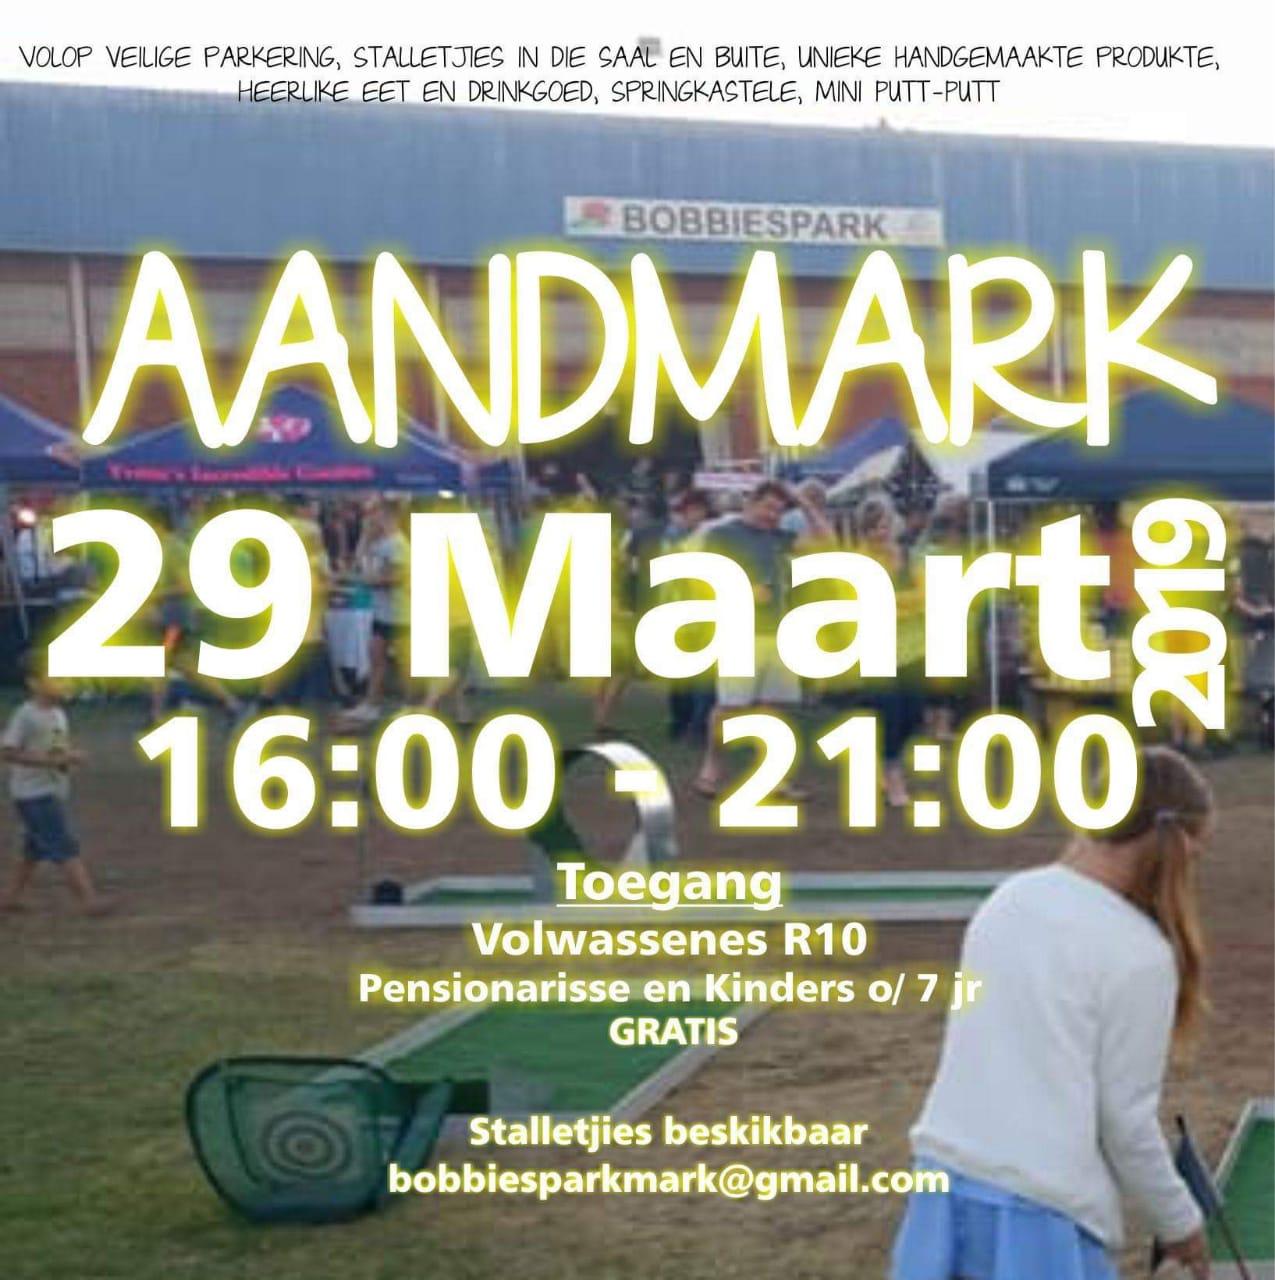 Aandmark @ Bobbiespark